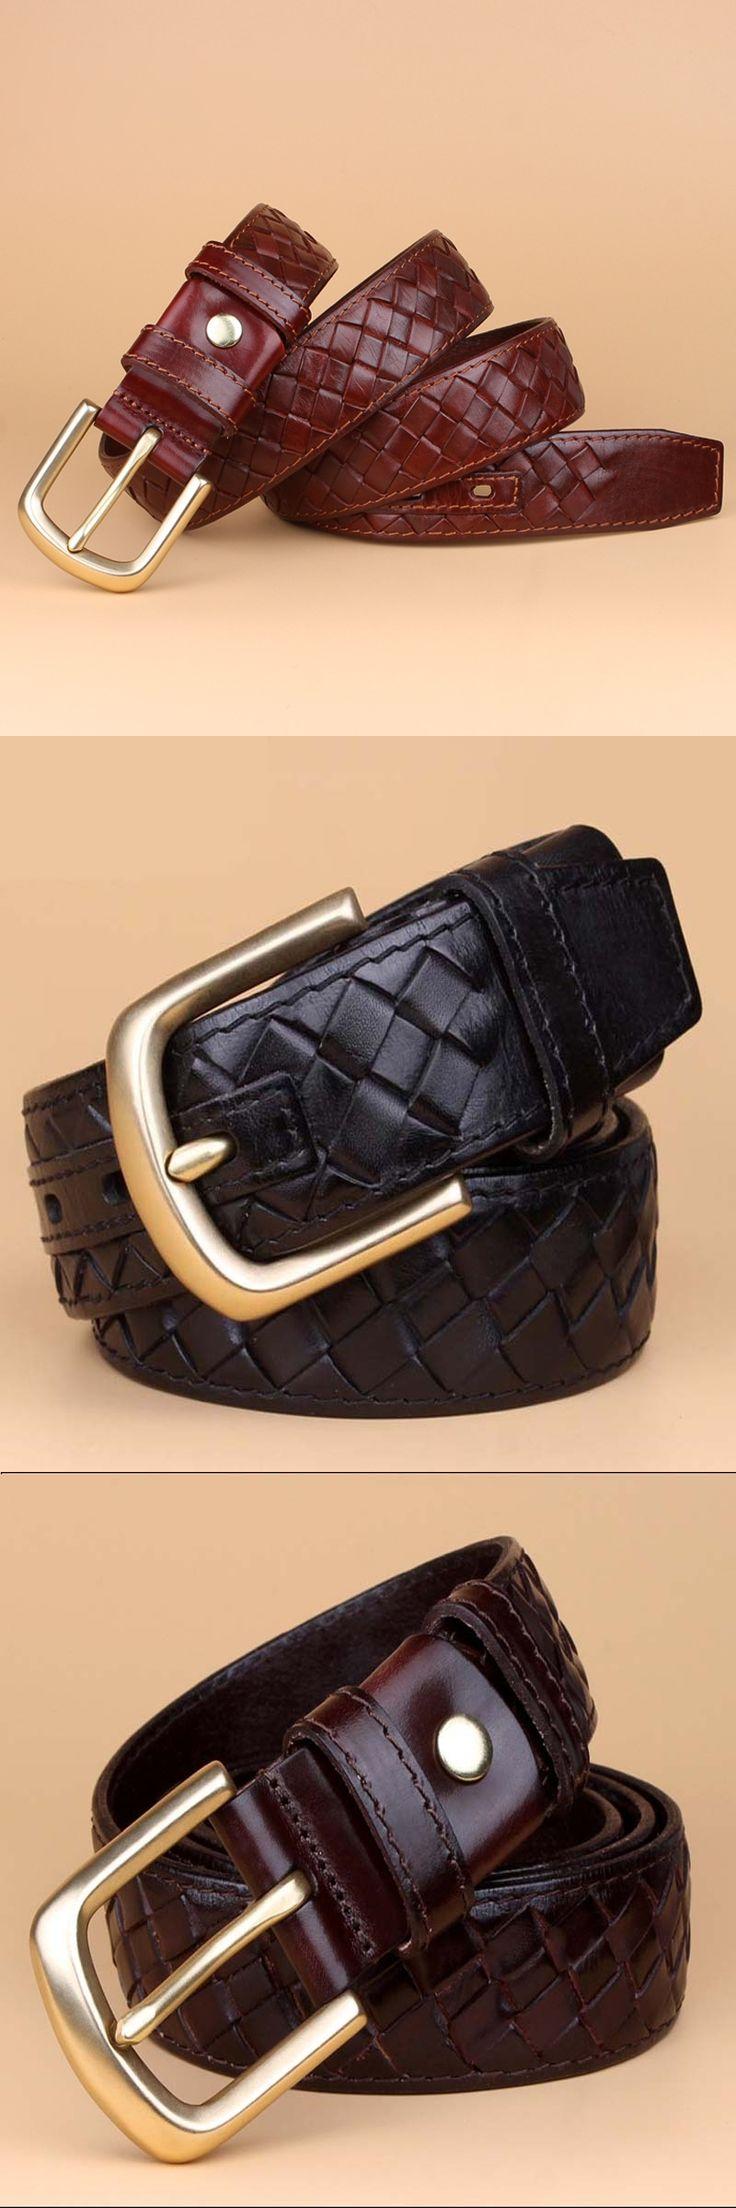 Men's belt luxury designer High quality Genuine leather man belt Pure cowhide skin strap male Formal men girdles & cummerbunds